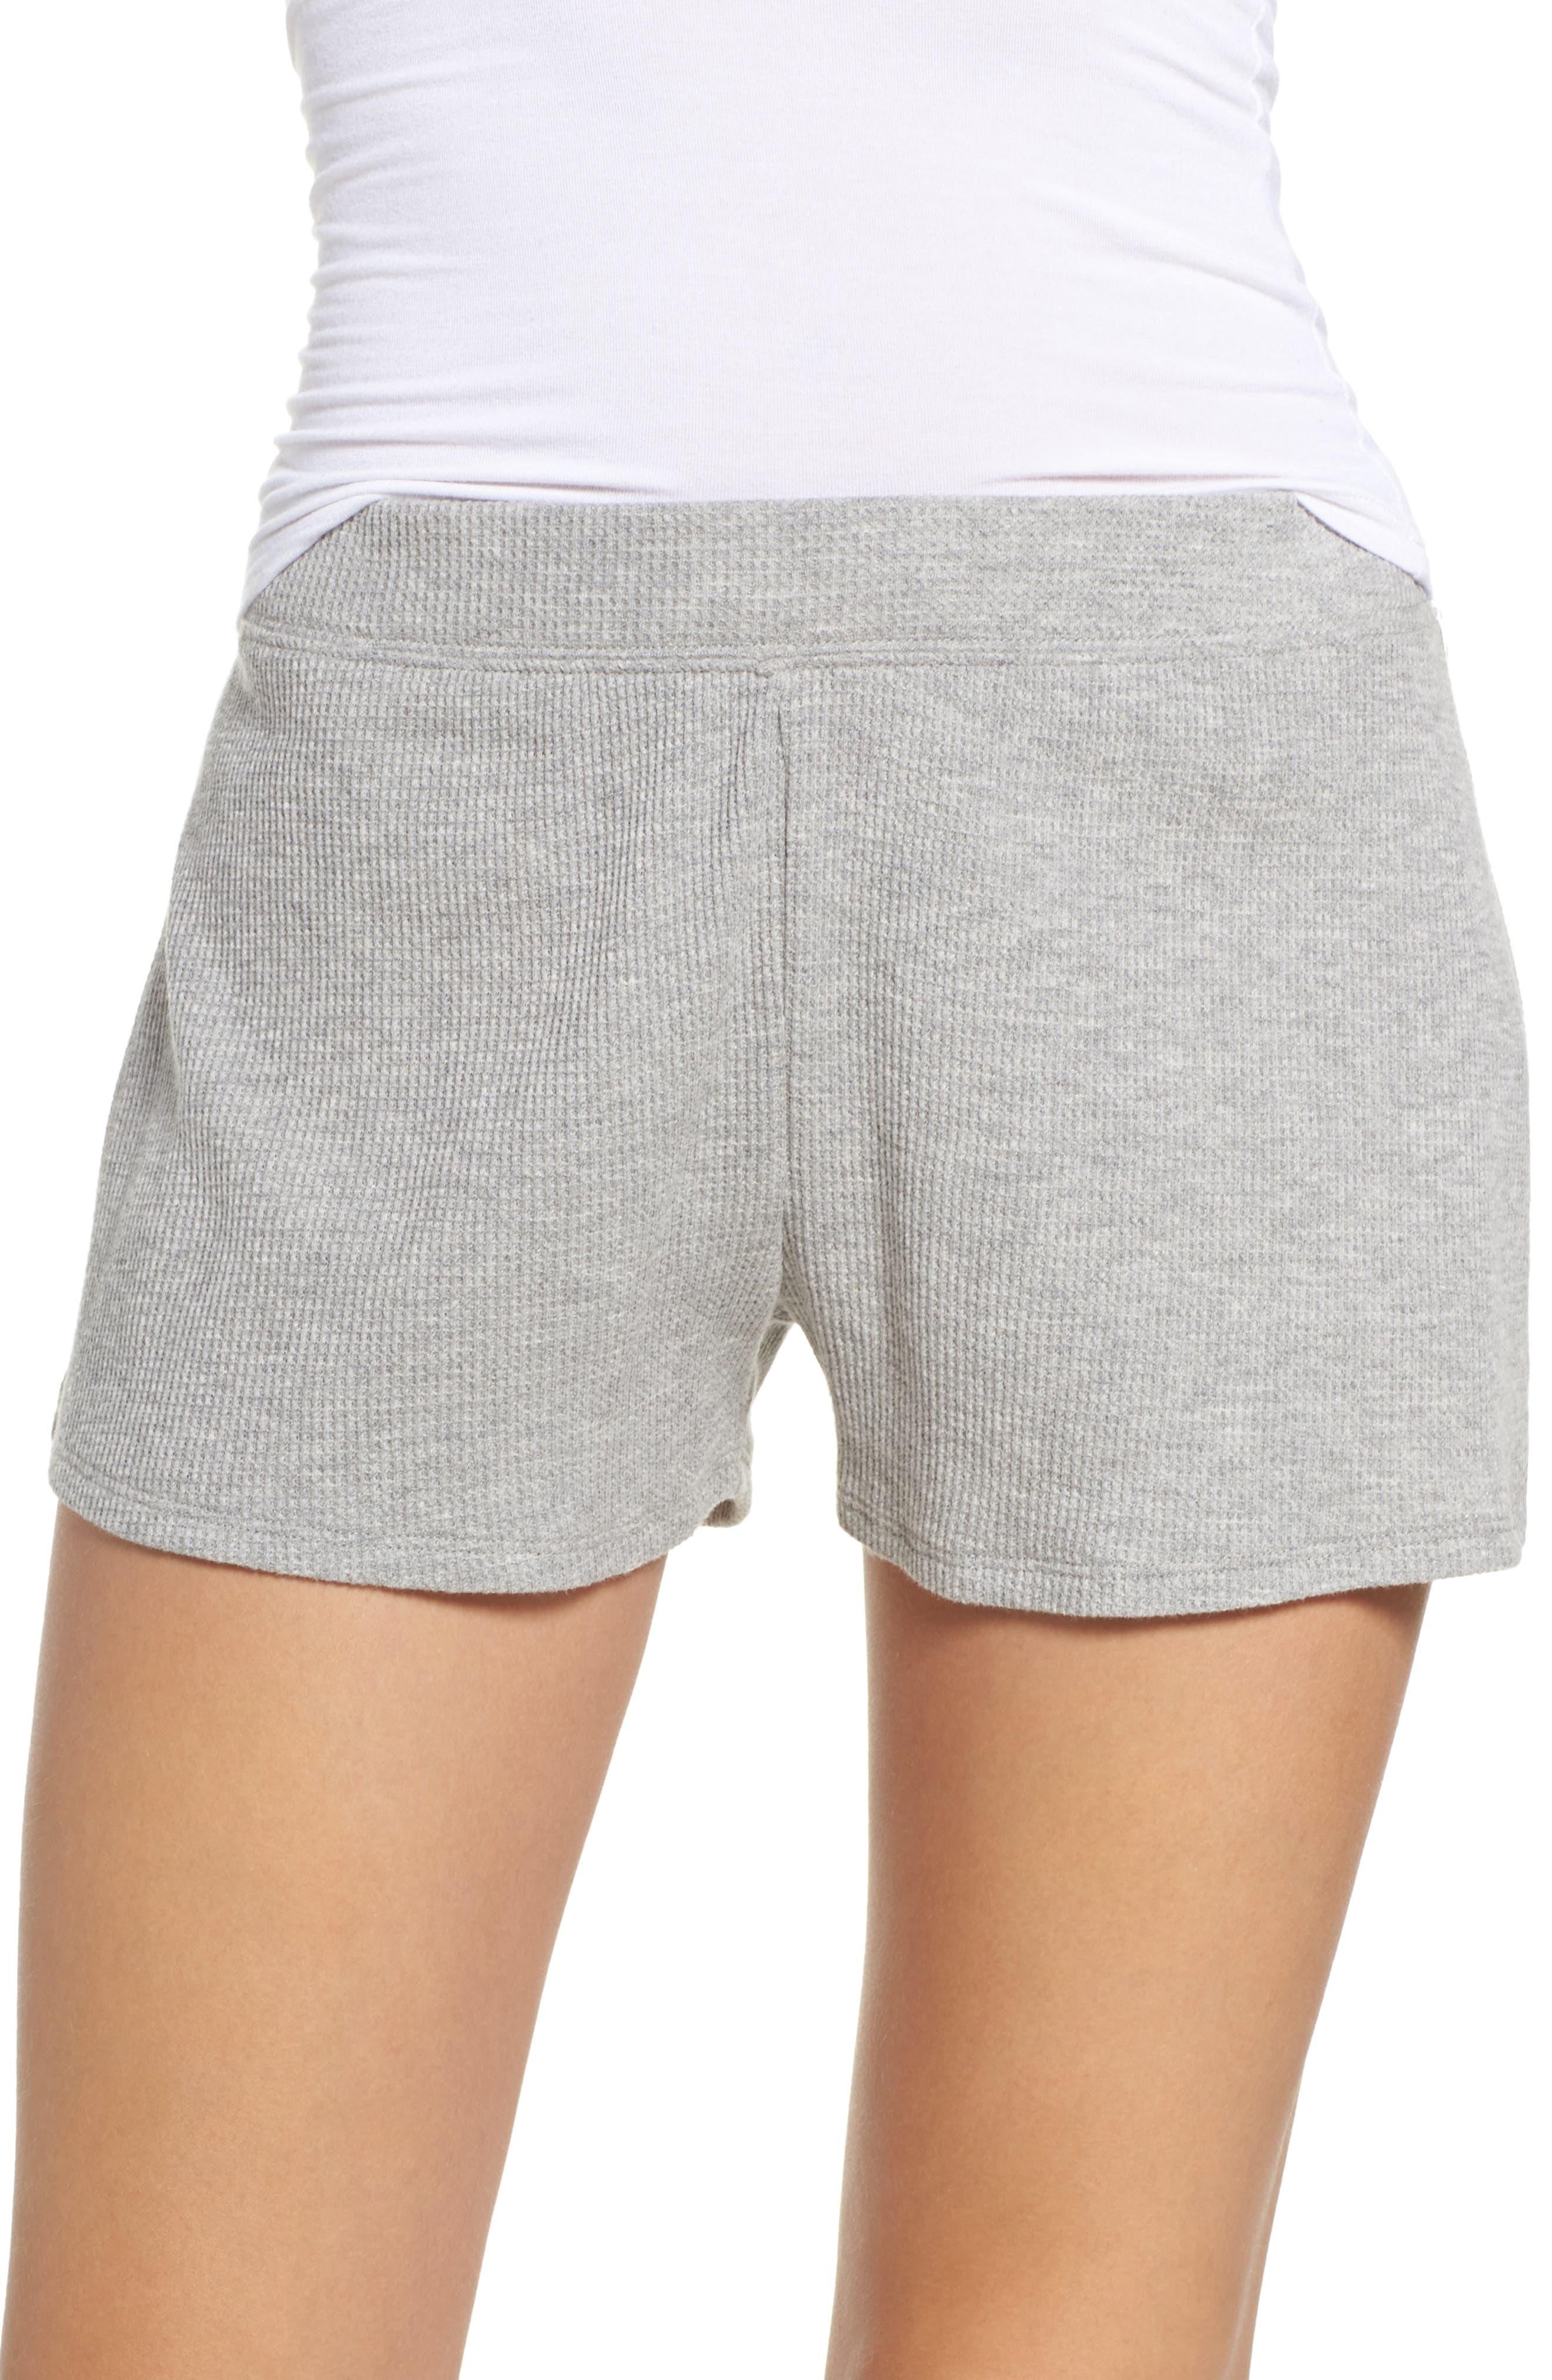 Waffle Knit Lounge Shorts,                         Main,                         color, Heather Grey